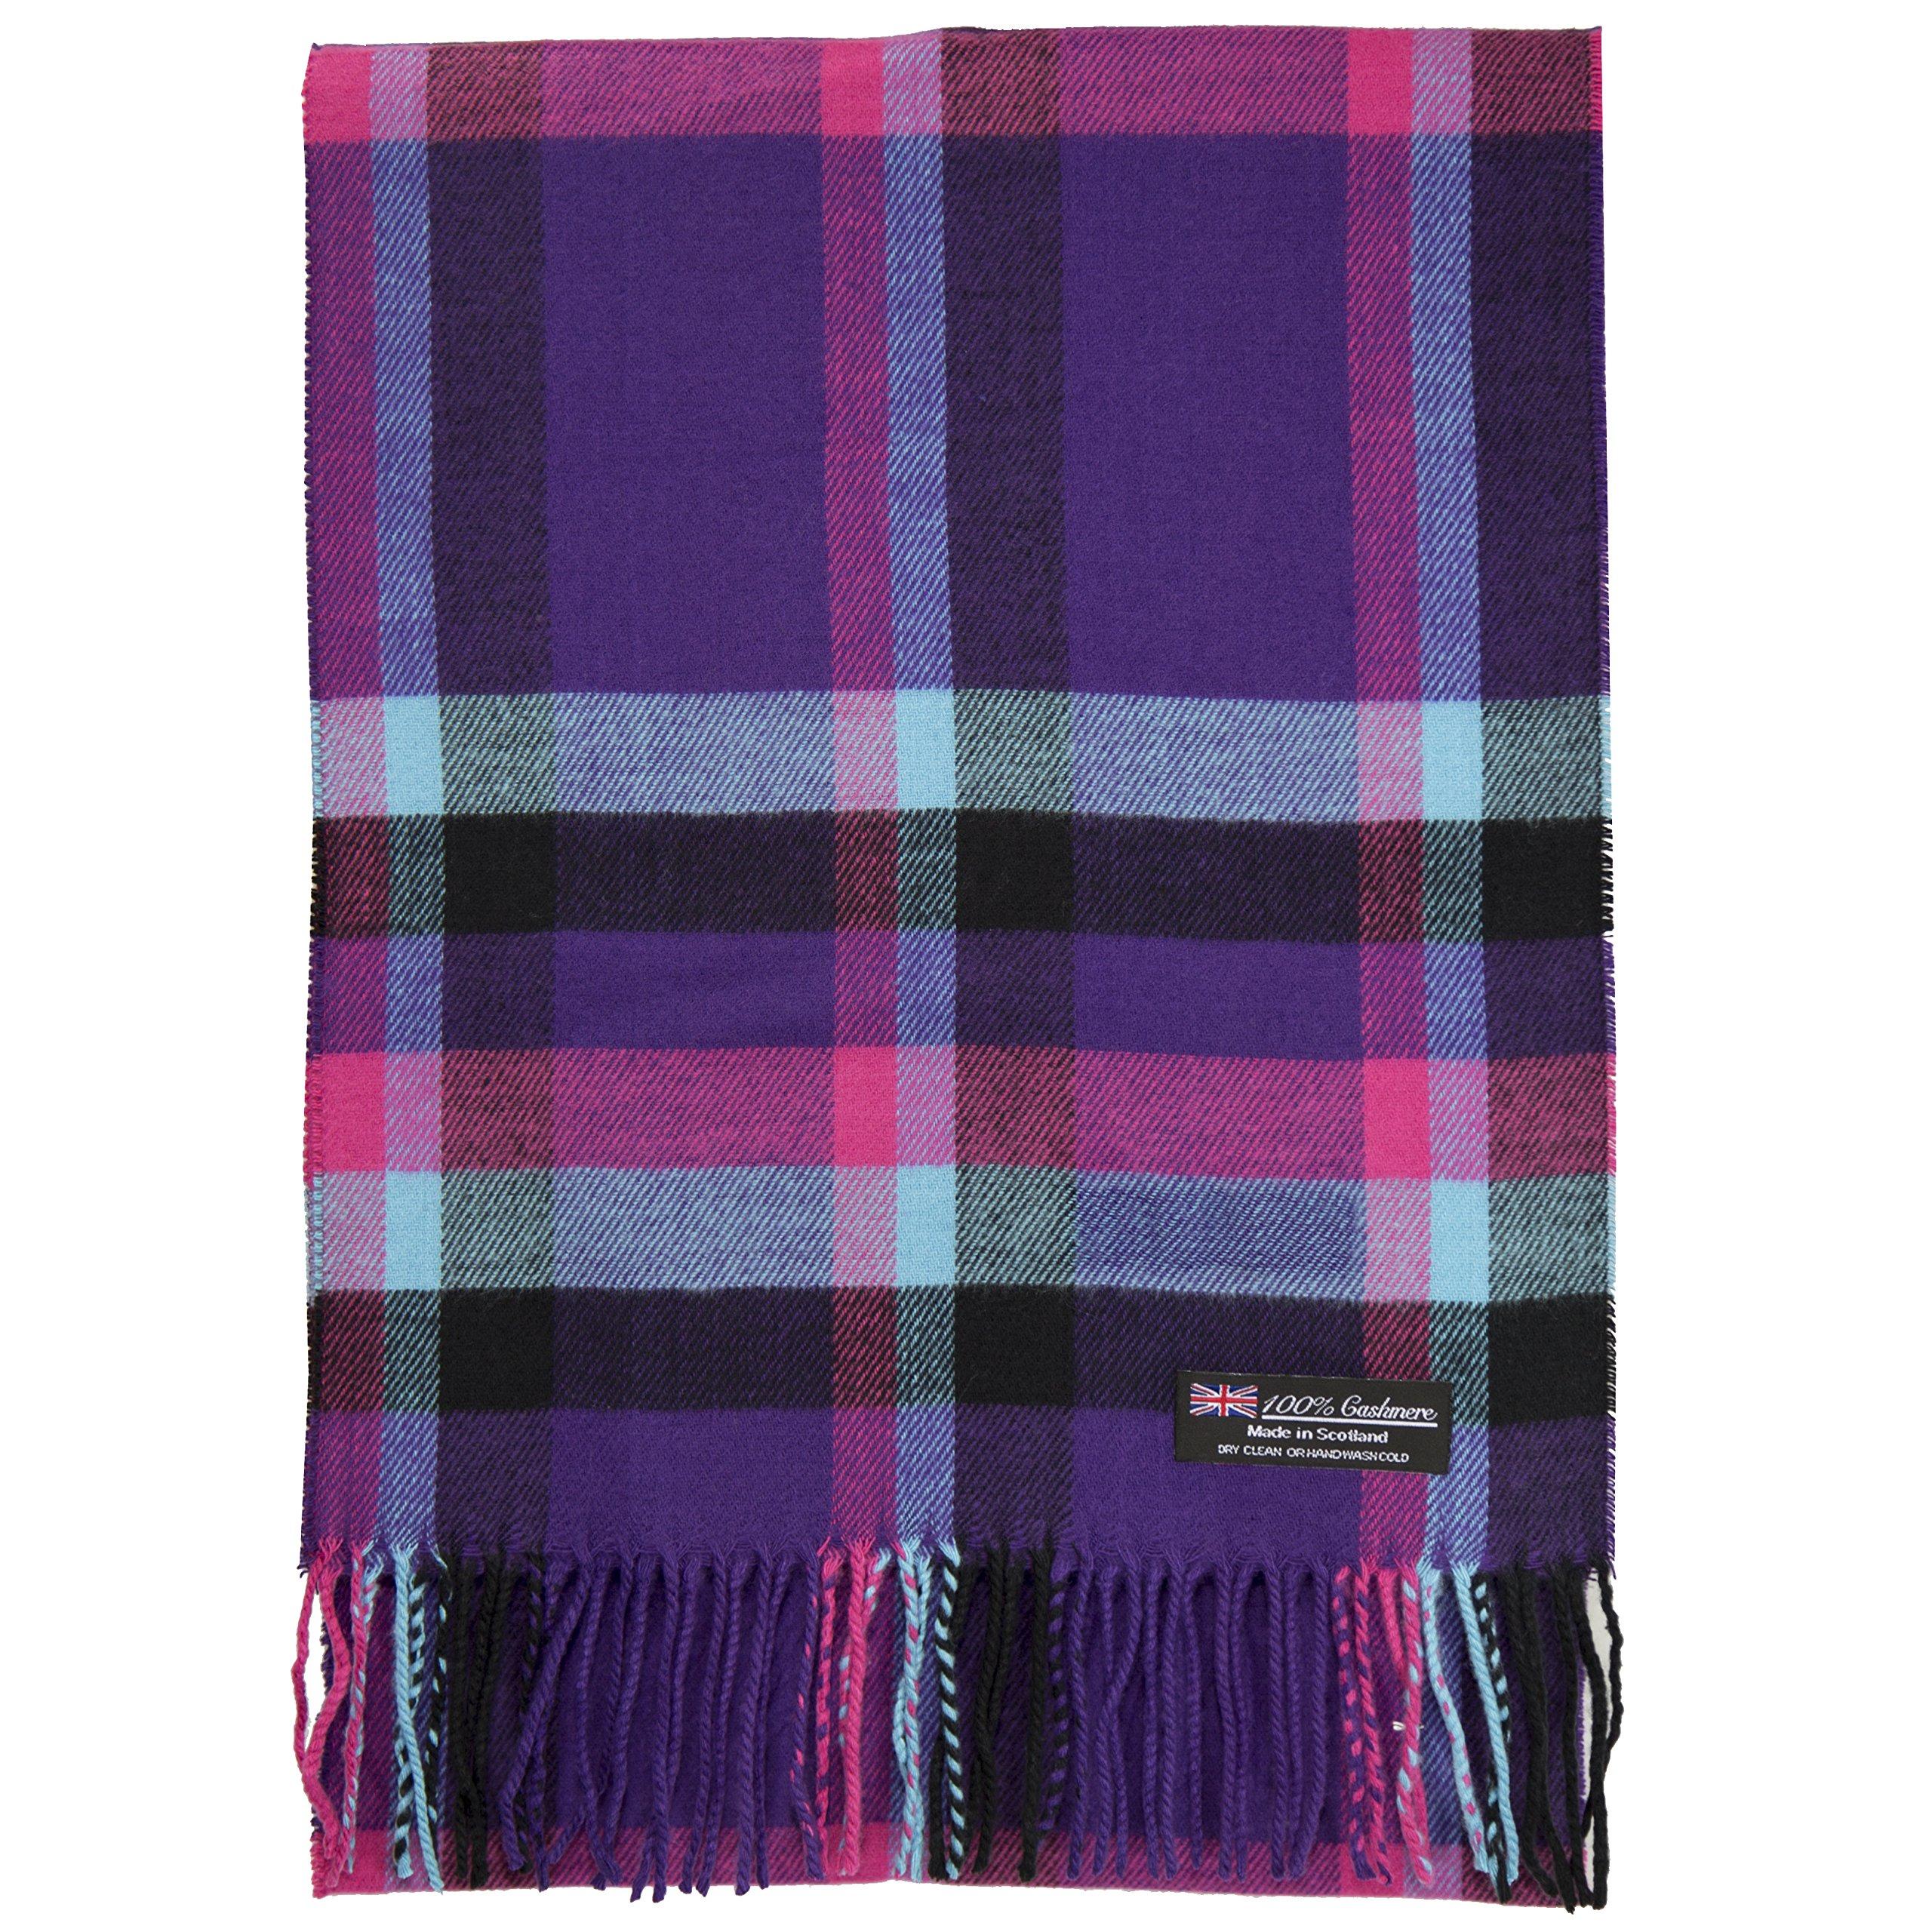 100% Cashmere Scarf Made in Scotland Wool Buffalo Tartan Windowpane Check Plaid (Hot Pink Blue Purple Black) by Cashmere Made in Scotland